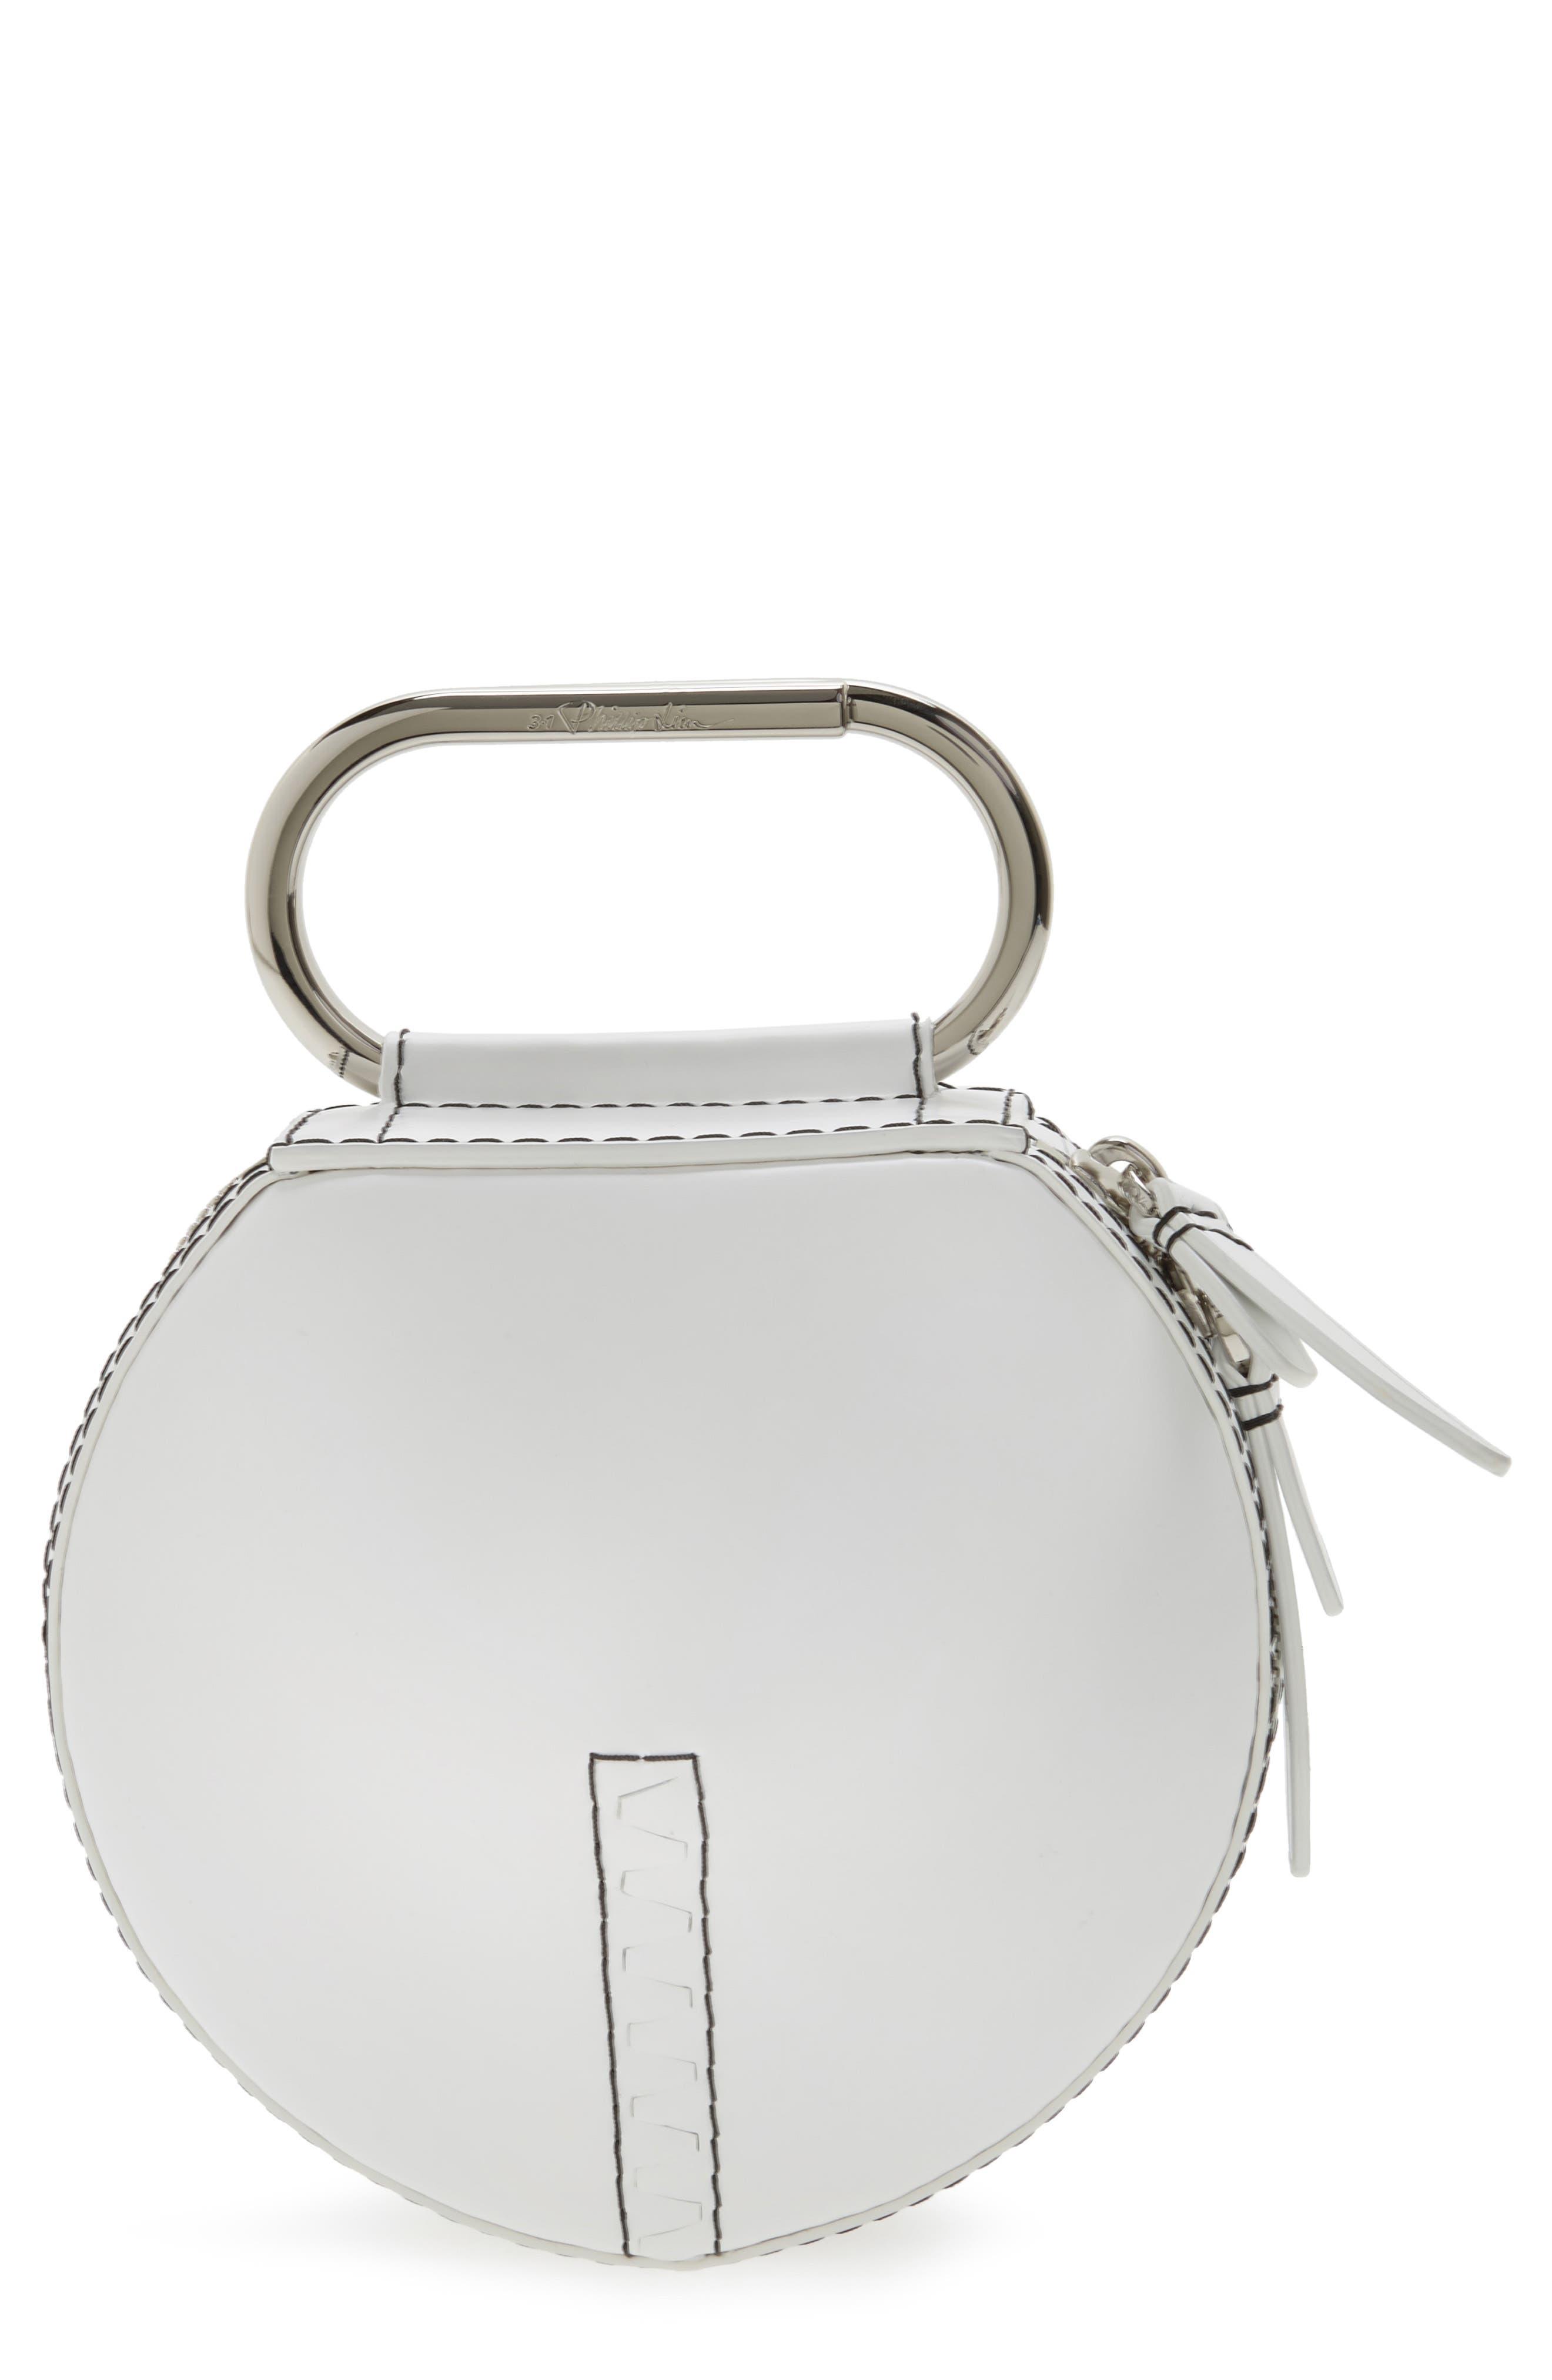 3.1 PHILLIP LIM Alix Leather Circle Clutch